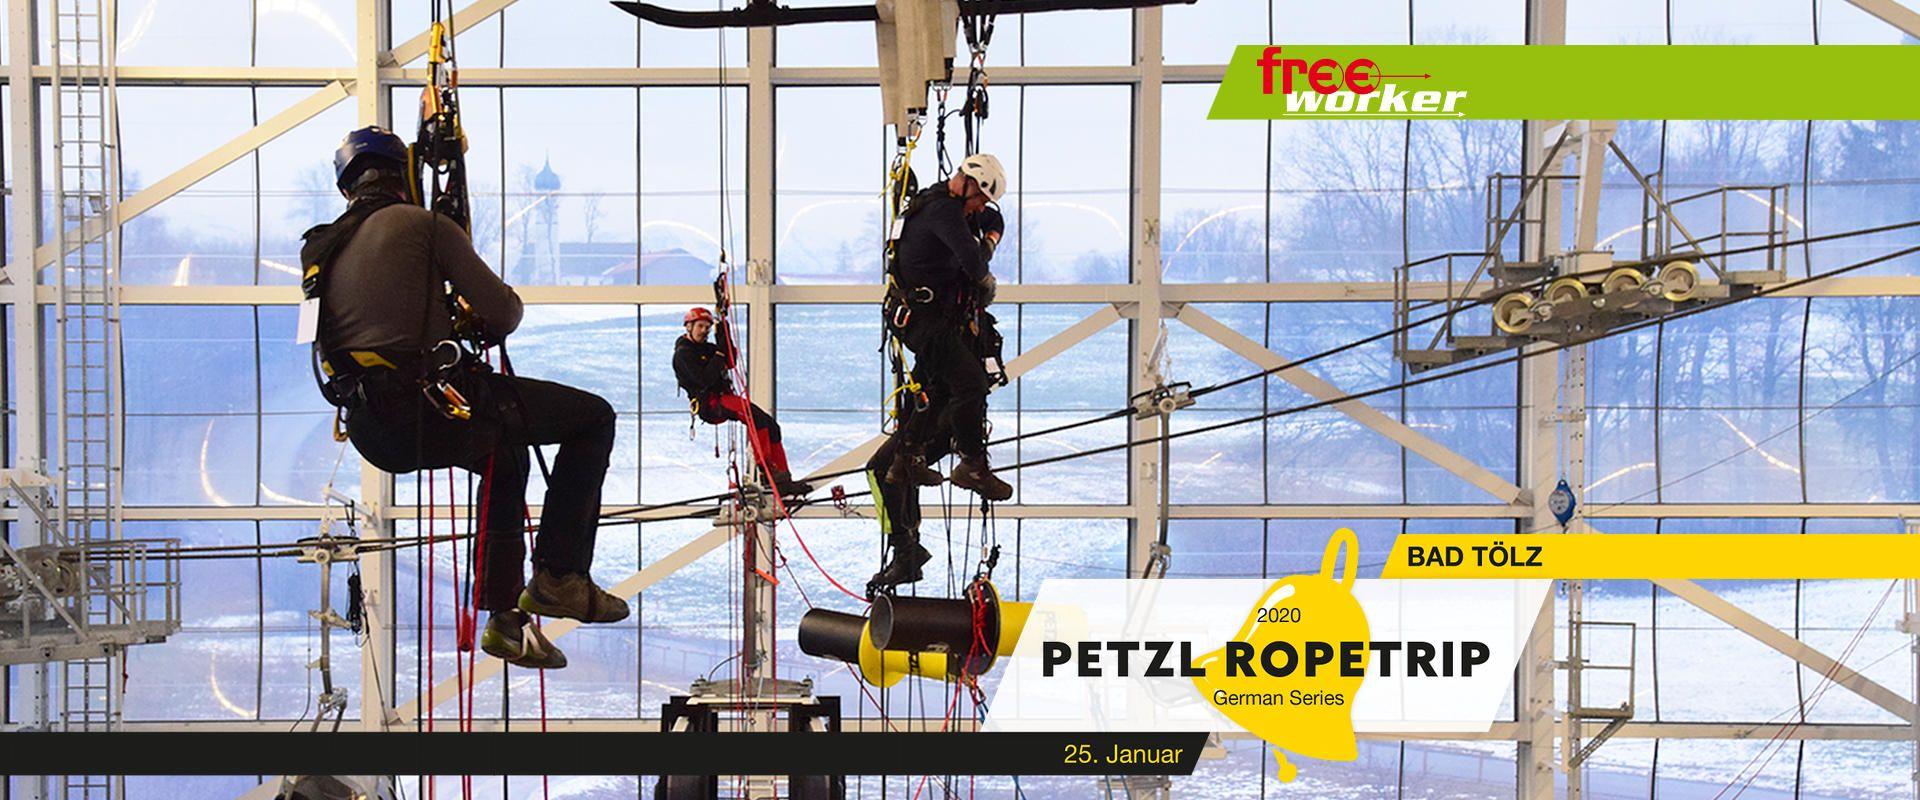 Permalink zu:Petzl RopeTrip® Series Germany 2020